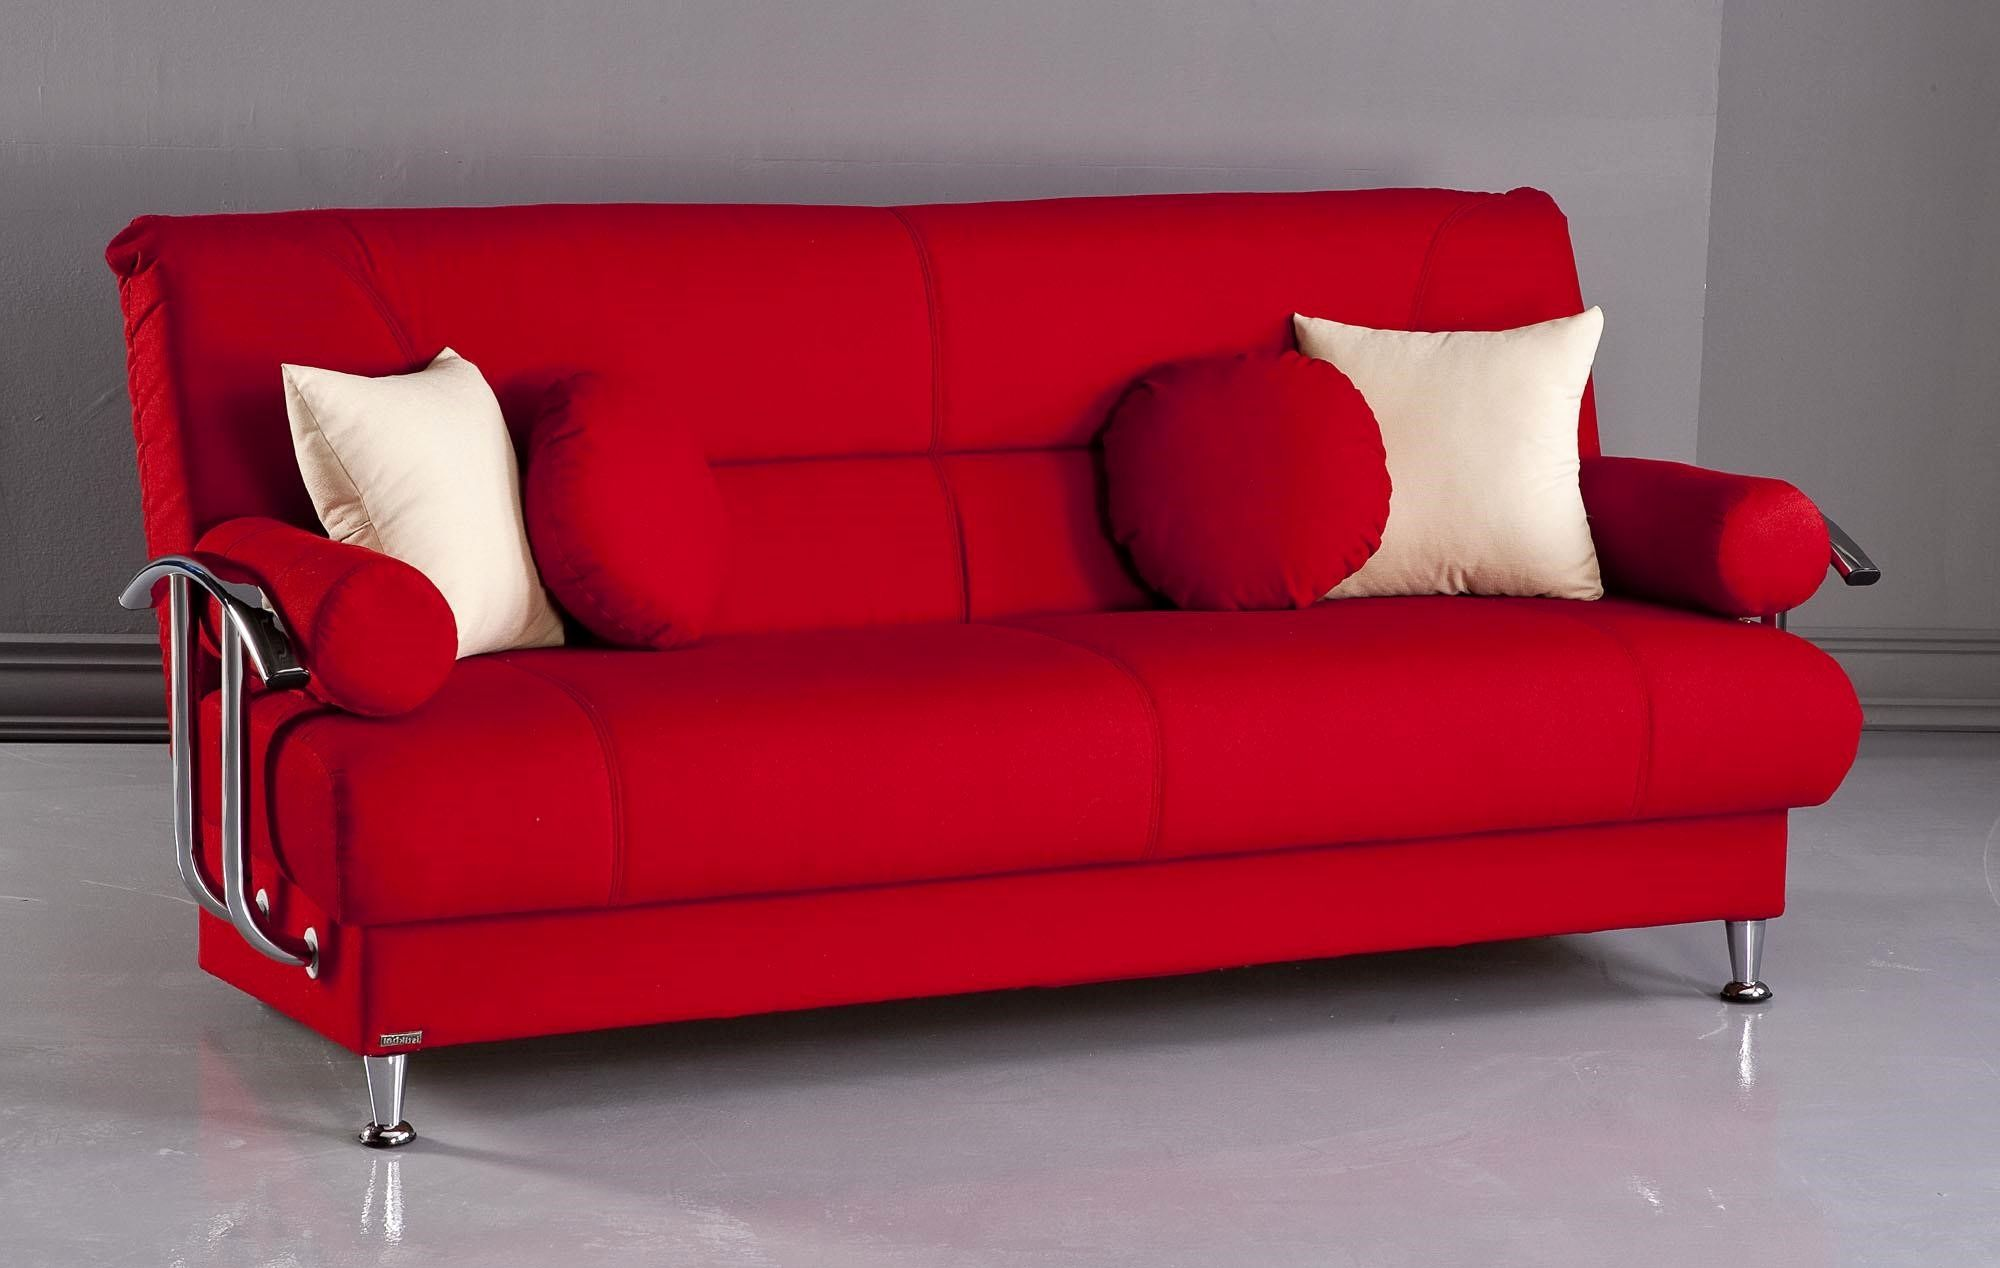 Phenomenal Best Of Microfiber Futon Sofa Futon Best Futon Sofa Bed Tar Evergreenethics Interior Chair Design Evergreenethicsorg